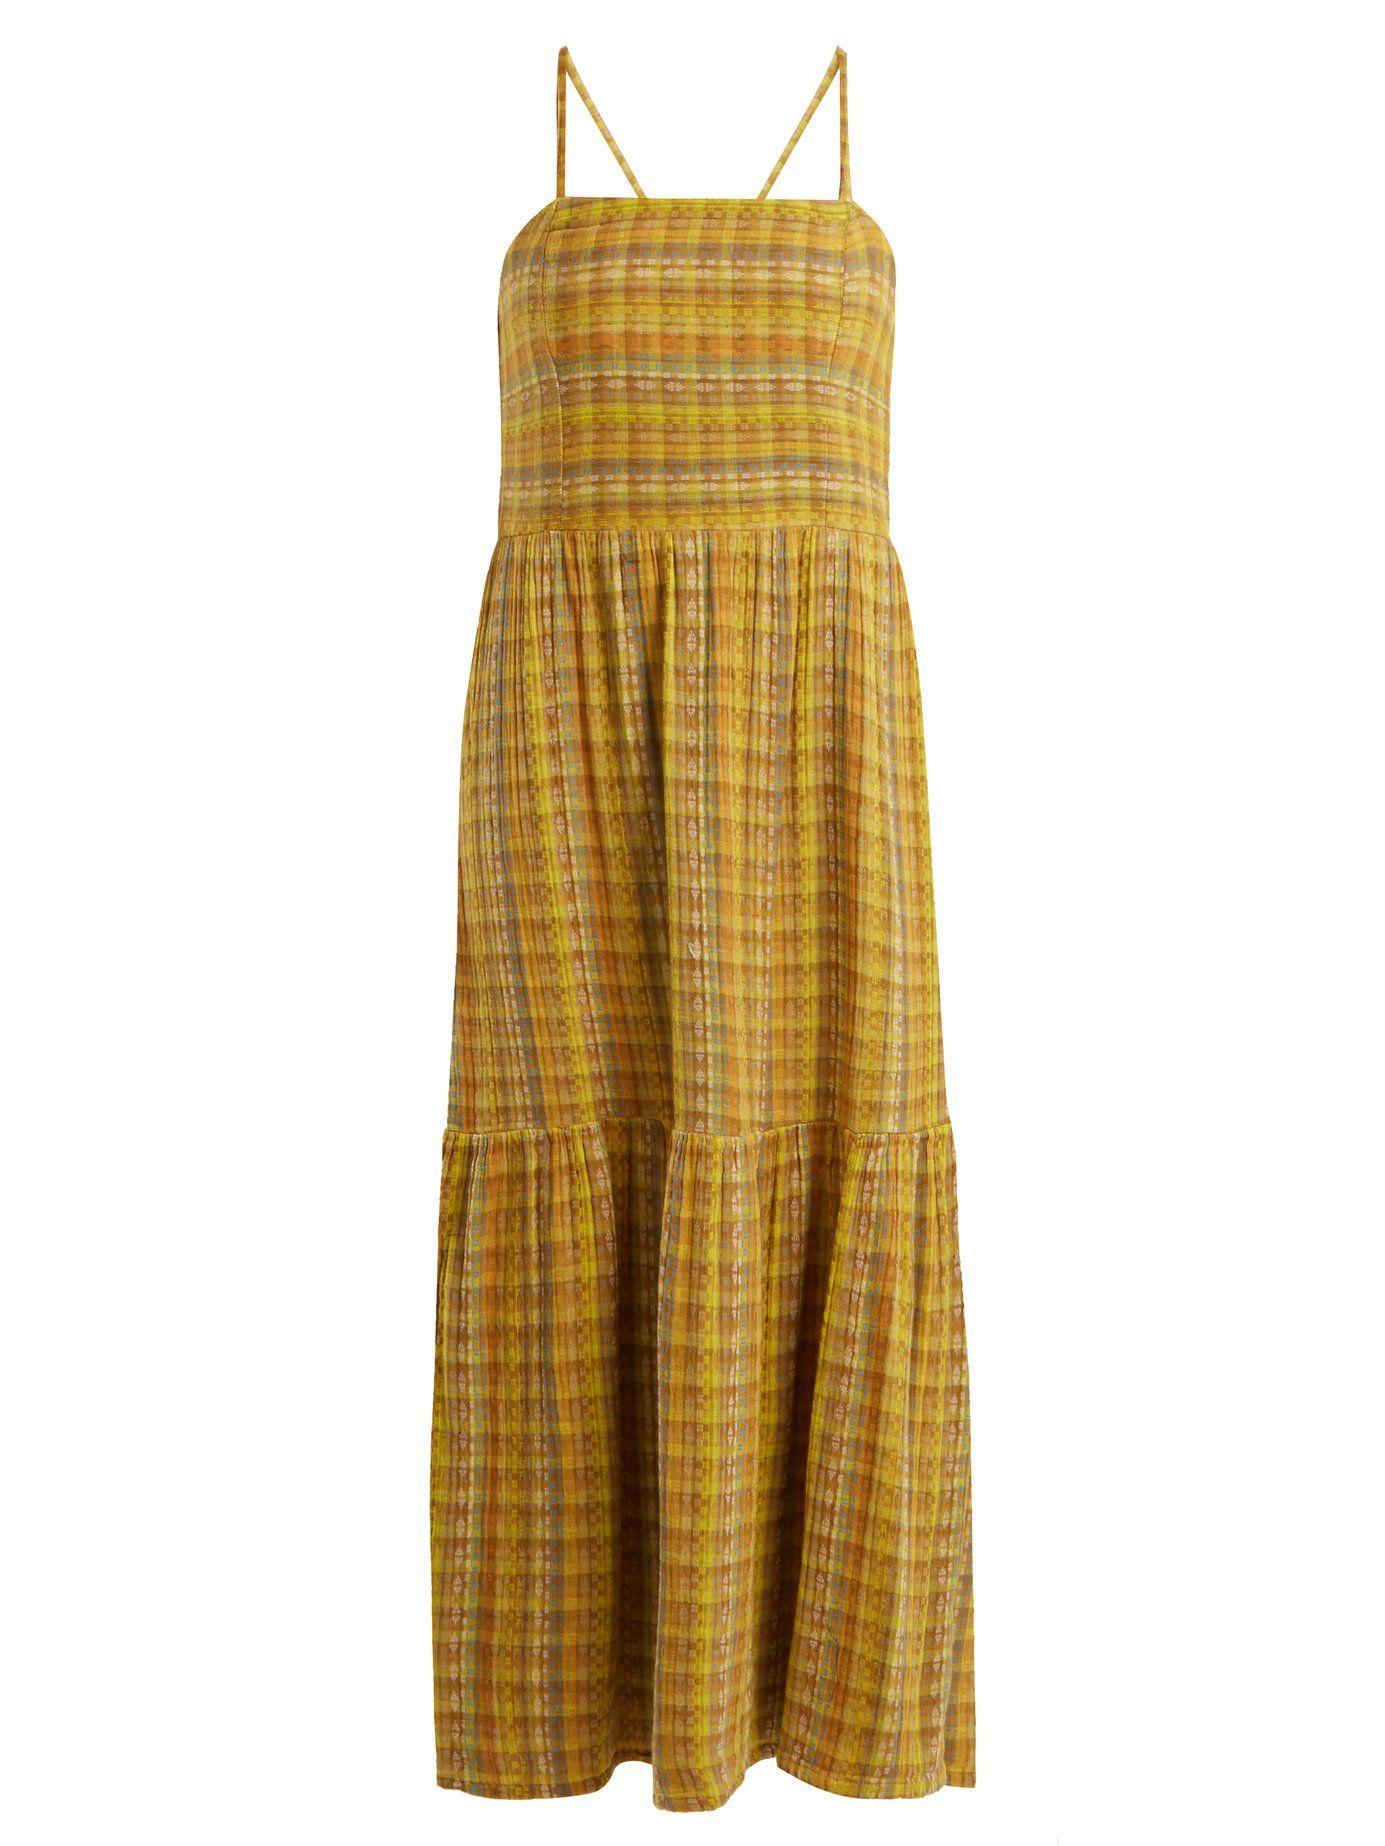 Dusty striped cotton-blend dress Ace & Jig Cheap Deals Pick A Best Online Clearance Reliable QohqcTj2